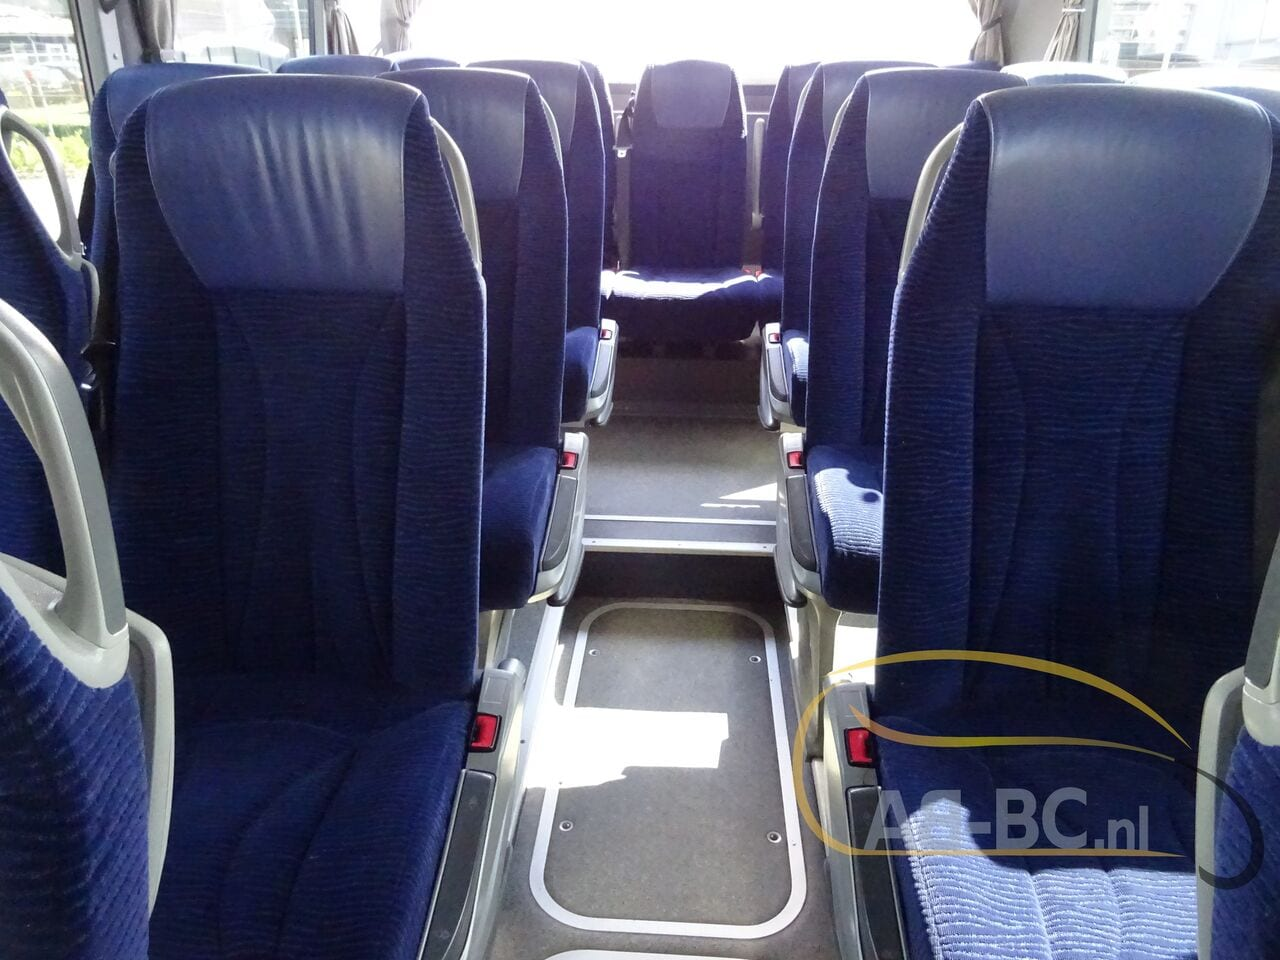 coach-busSETRA-S415-GT-HD-FINAL-EDITION-51-SEATS-LIFTBUS---1620382077793152131_big_c63f4118e226f21dd06bb526c9312696--21050713010665719300